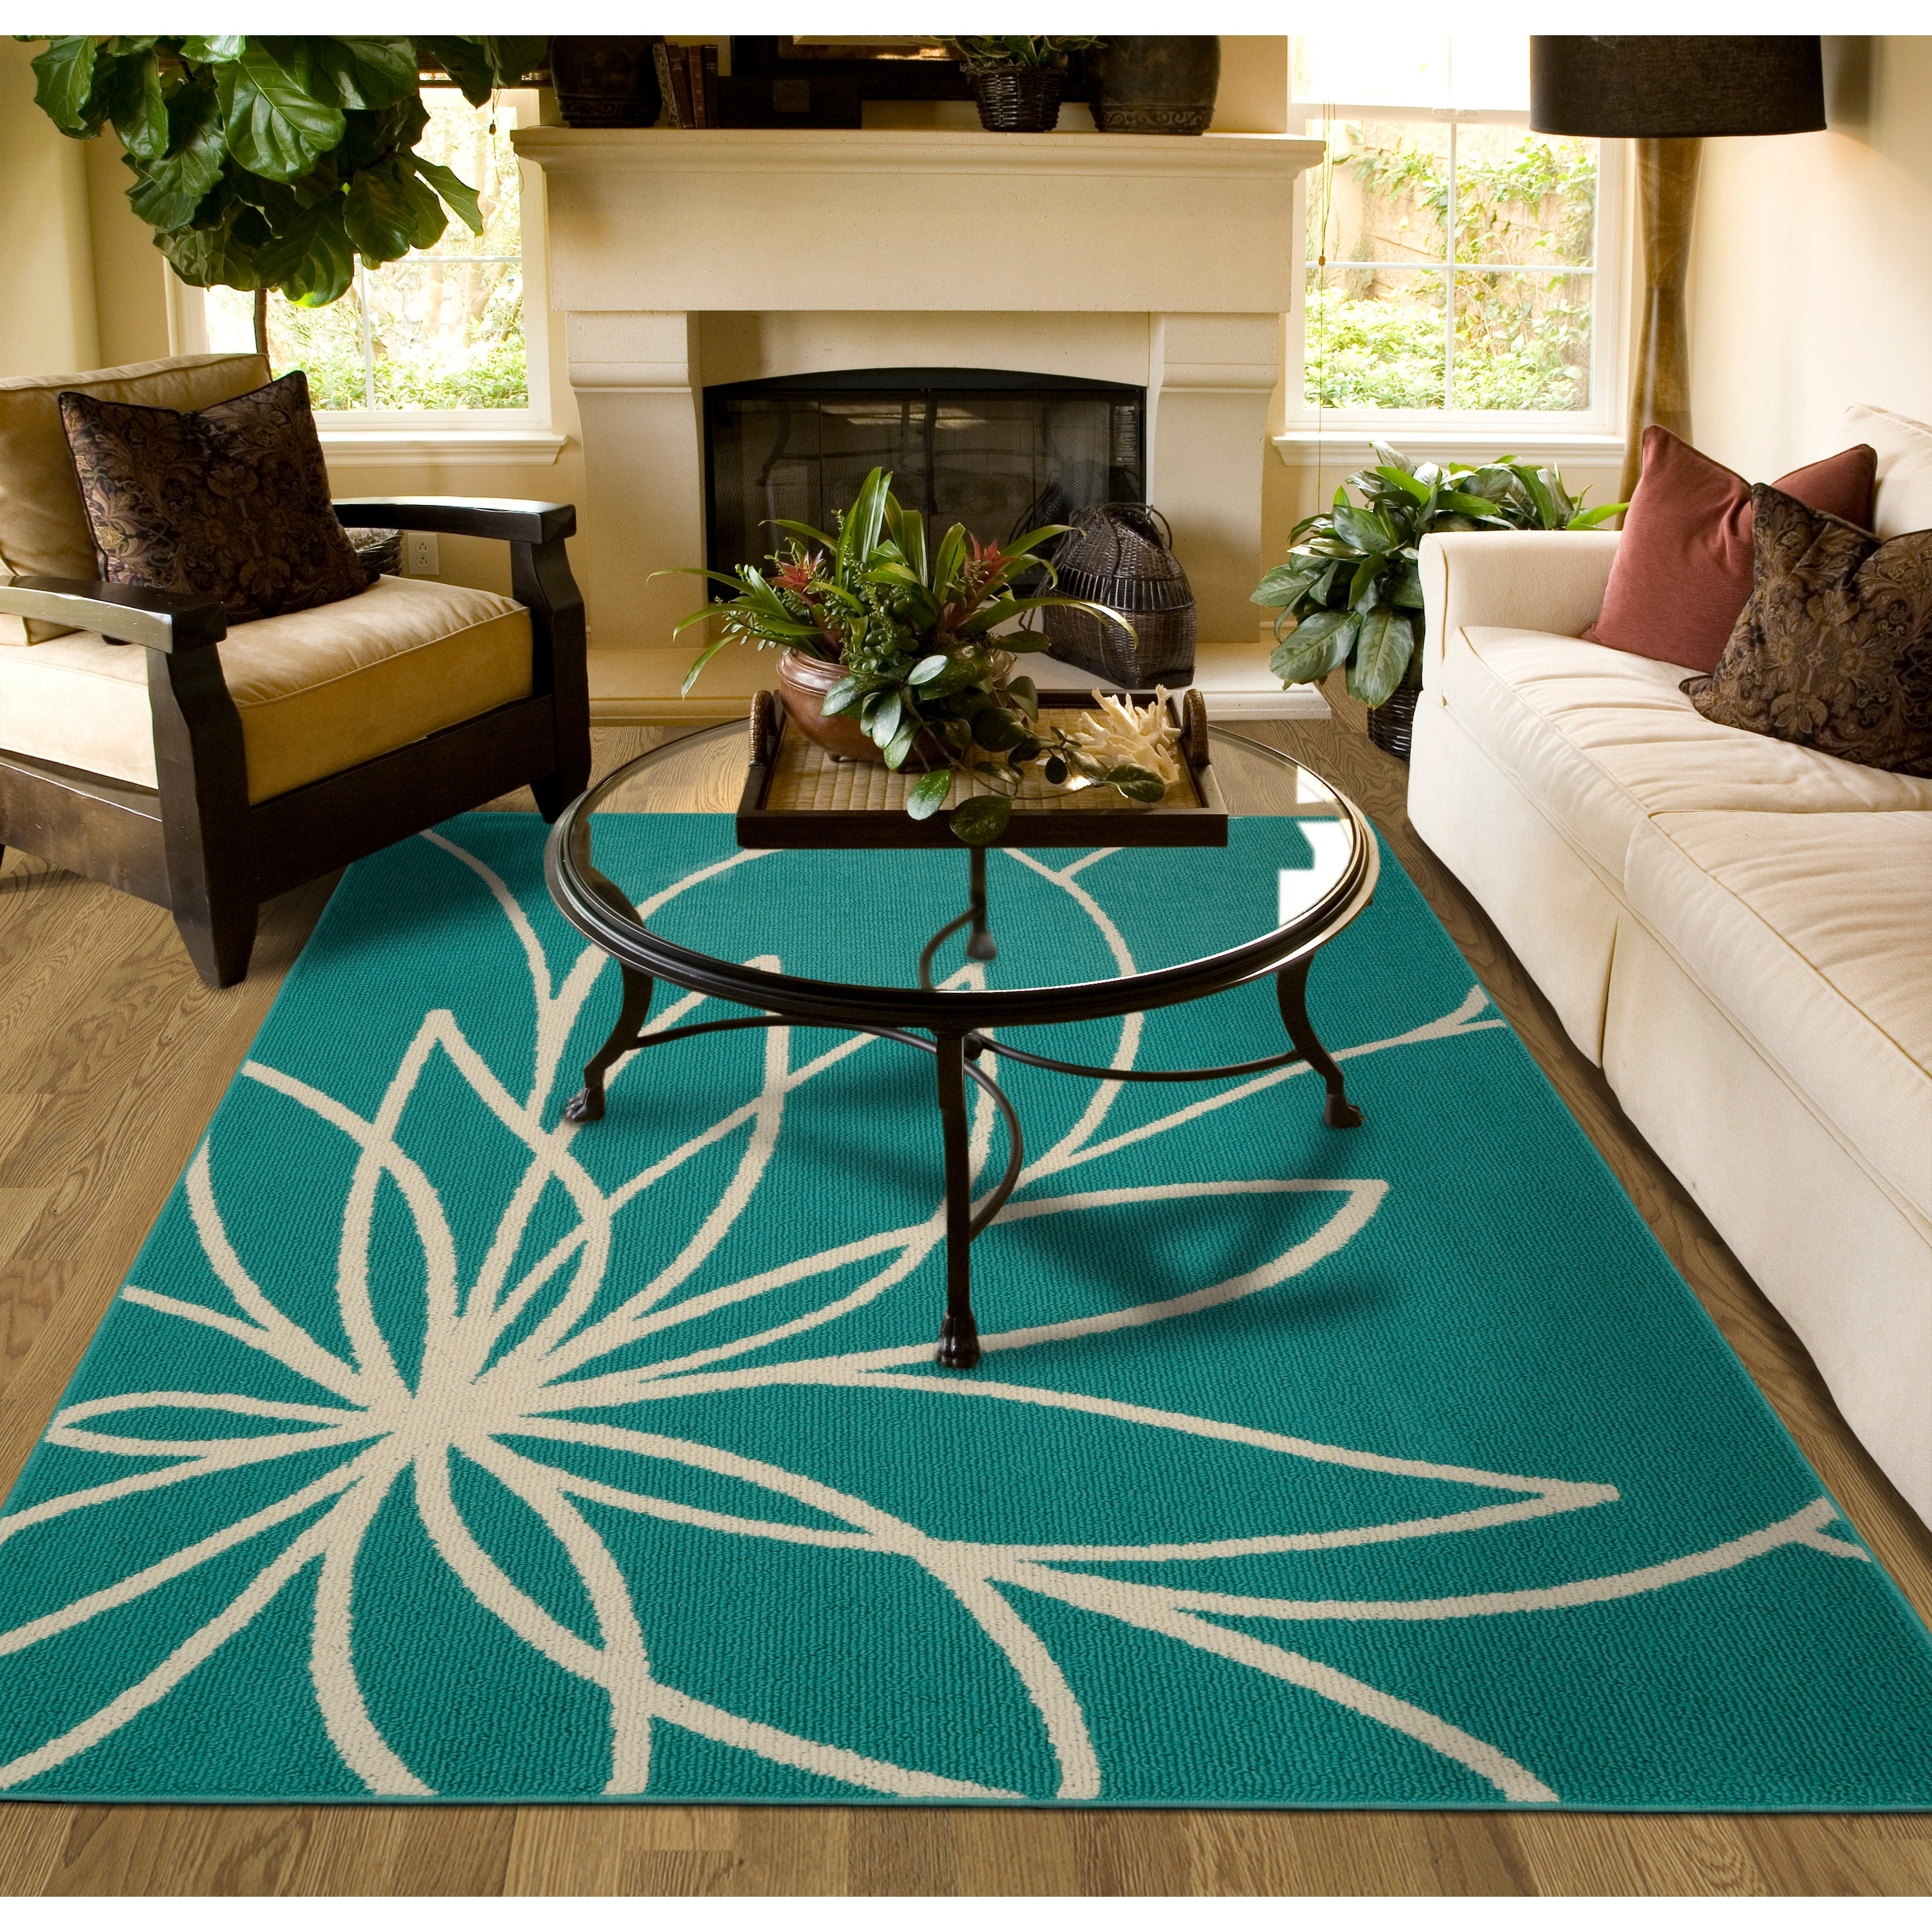 Grand Floral Teal/Ivory Large Living Room Area Rug